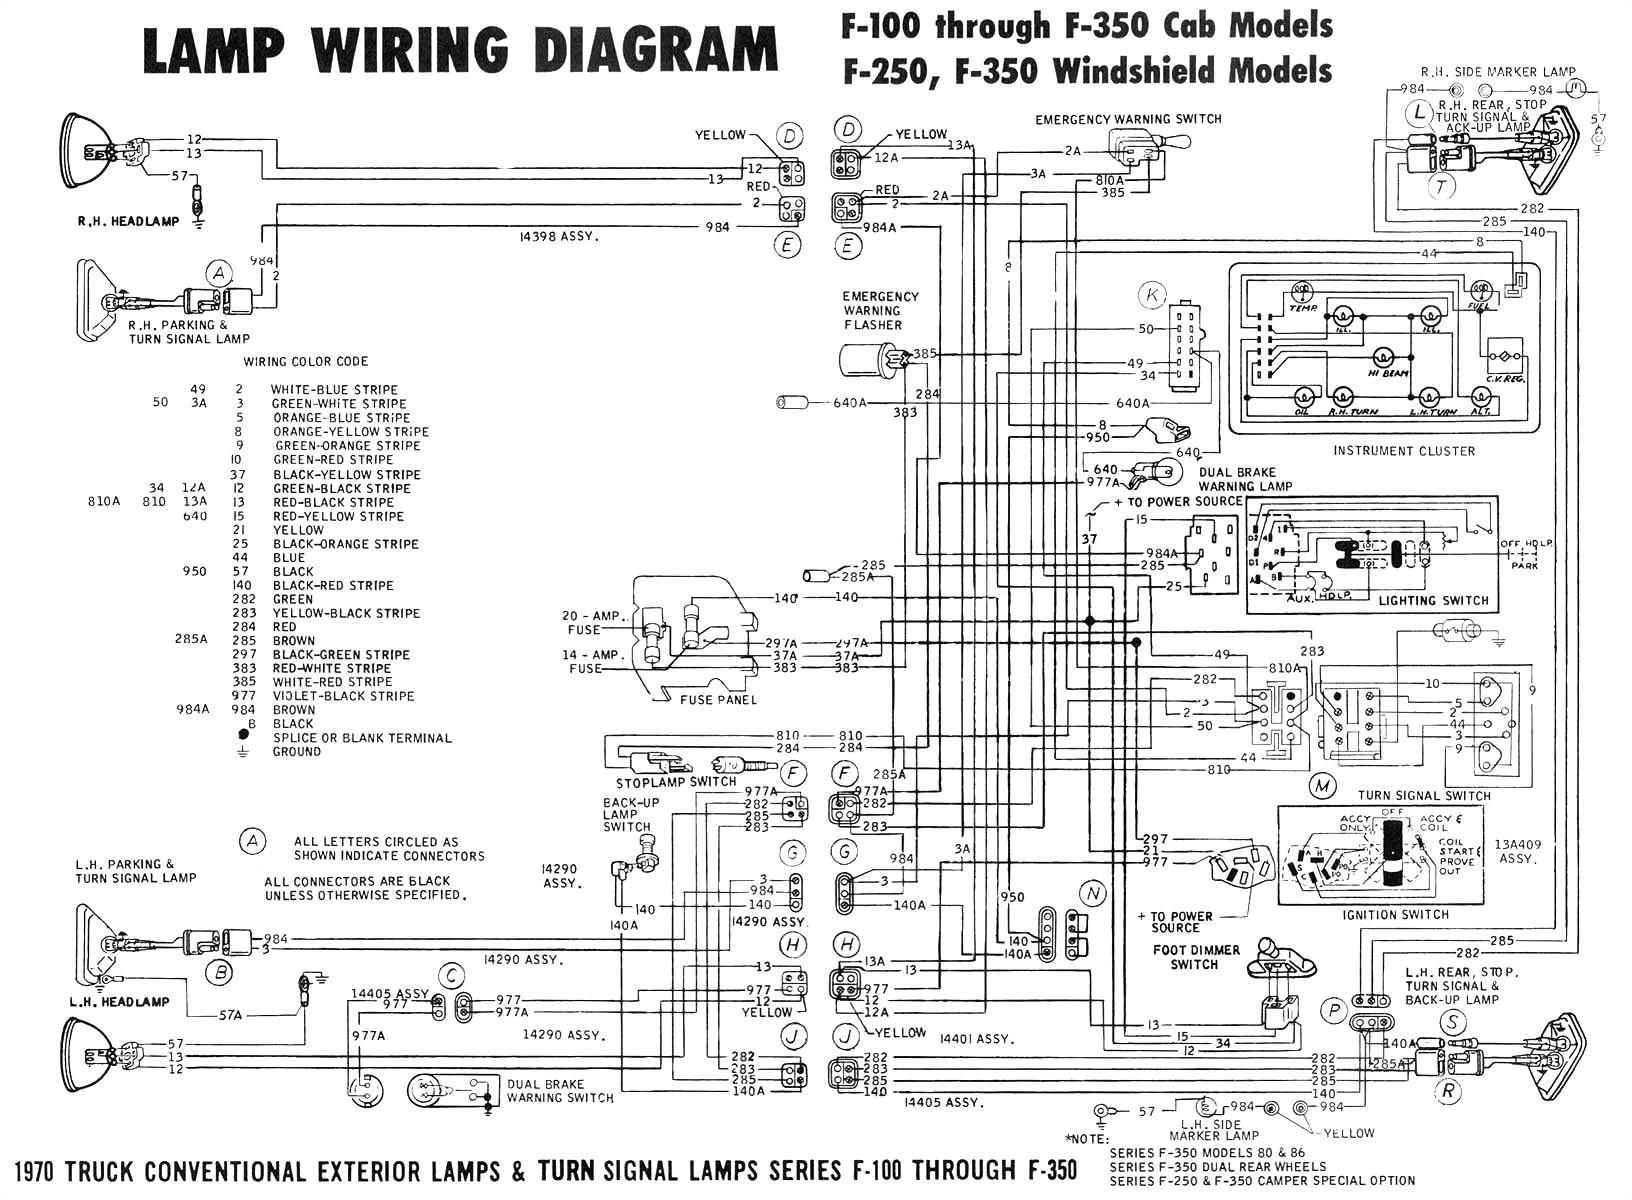 toyota tacoma trailer wiring diagram trailer wiring diagram toyota ta a inspirationa 2000 f250 trailer wiring diagram 10t jpg